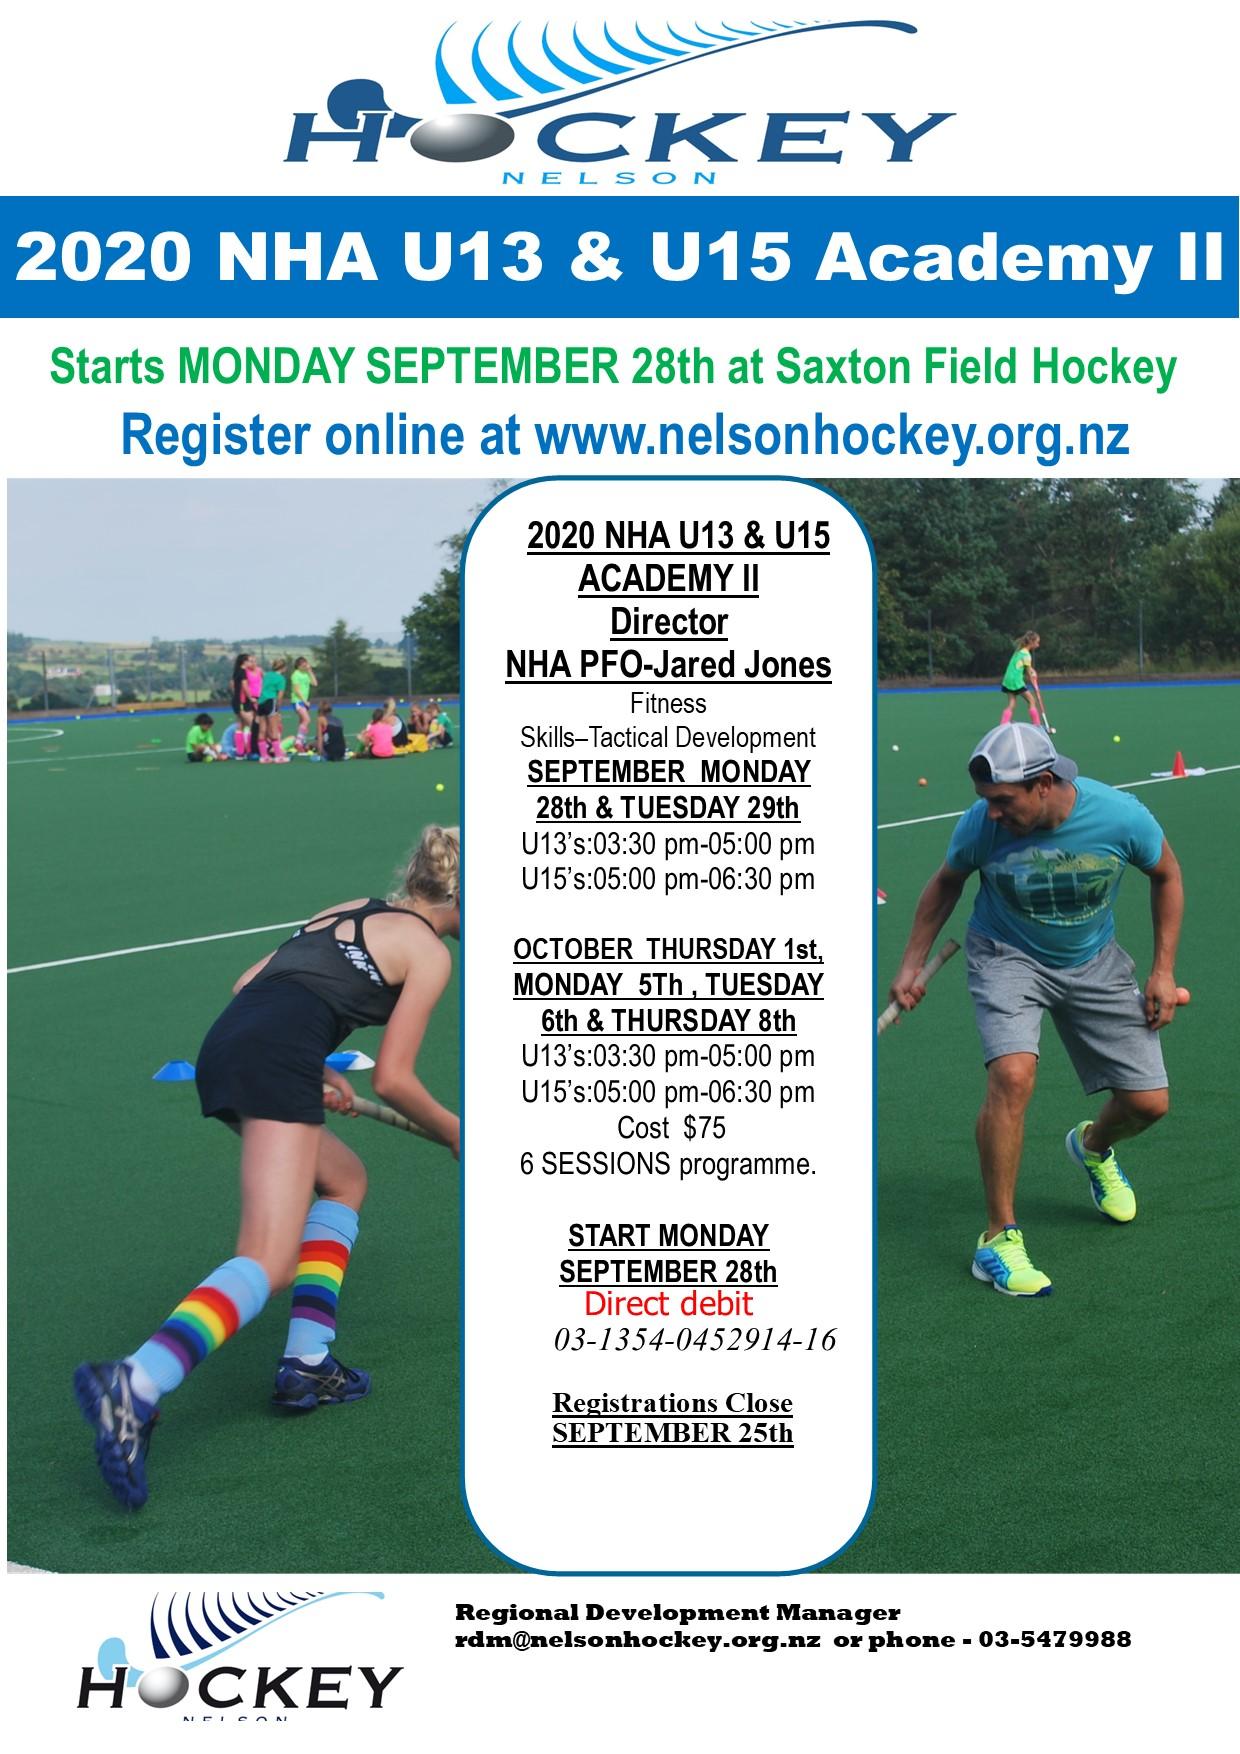 2020 NHA U13 & U15 ACADEMY II Start Monday September 28th! Registrations Open!!!